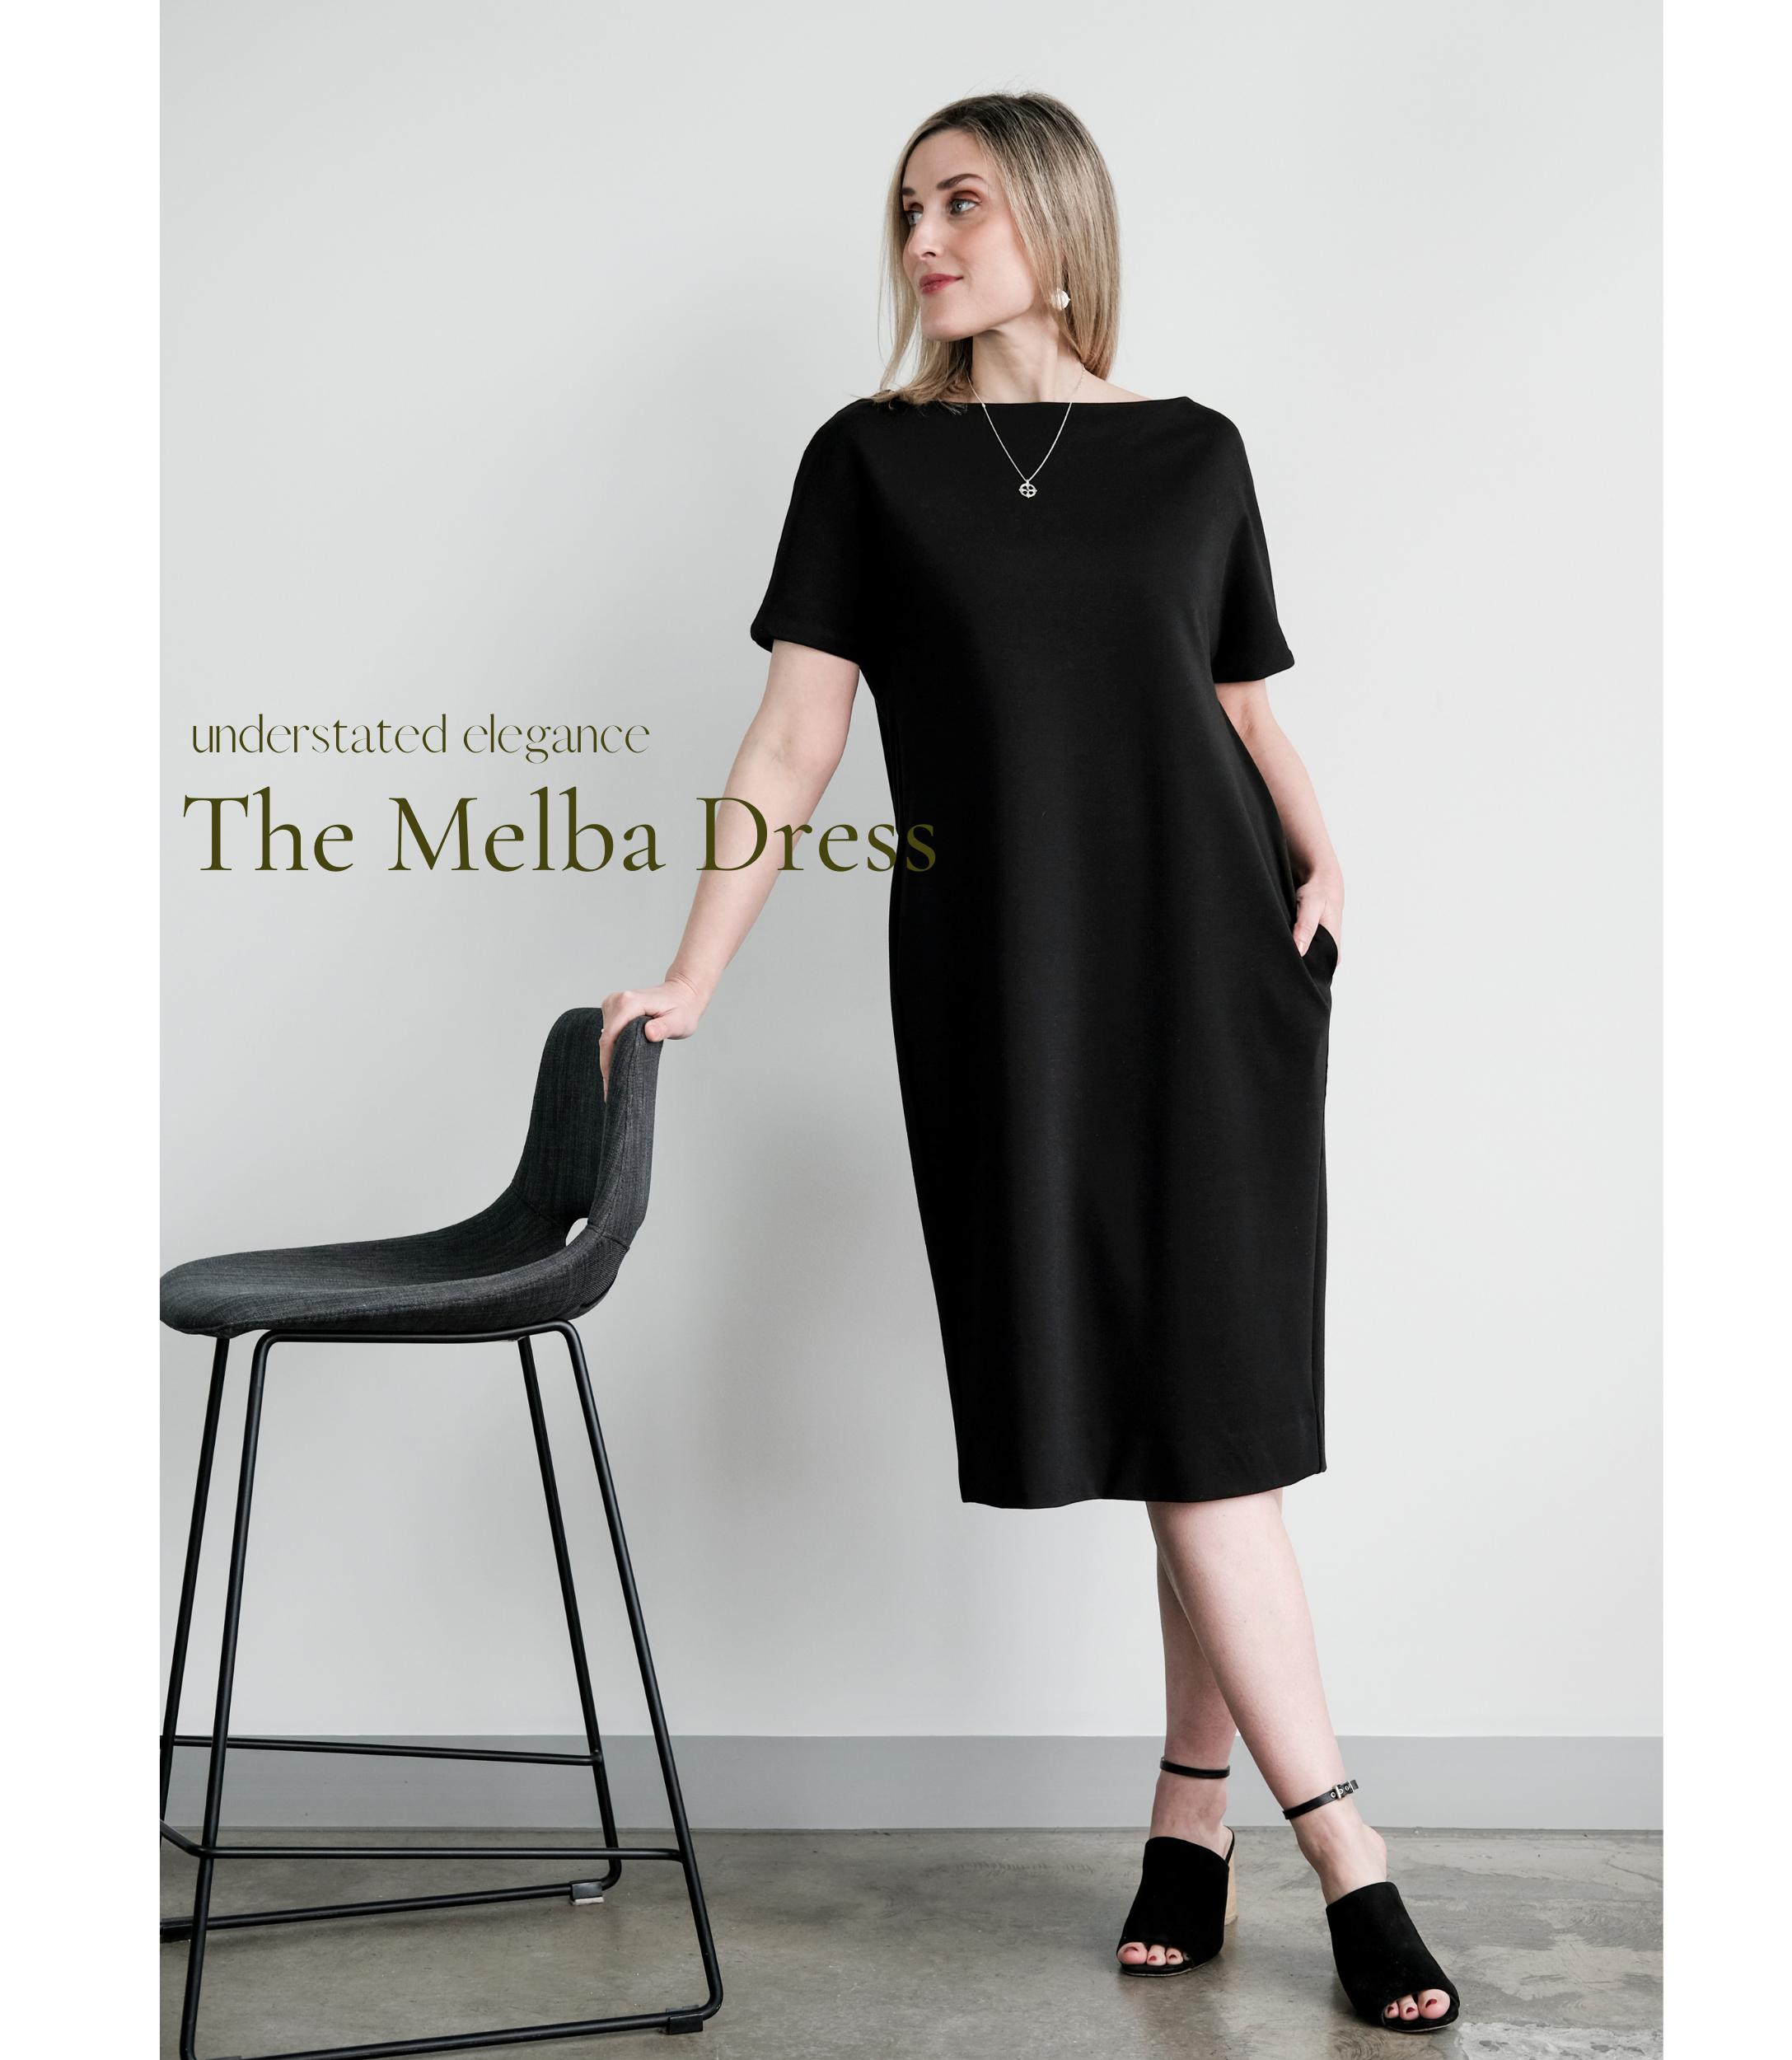 New release Melba Dress